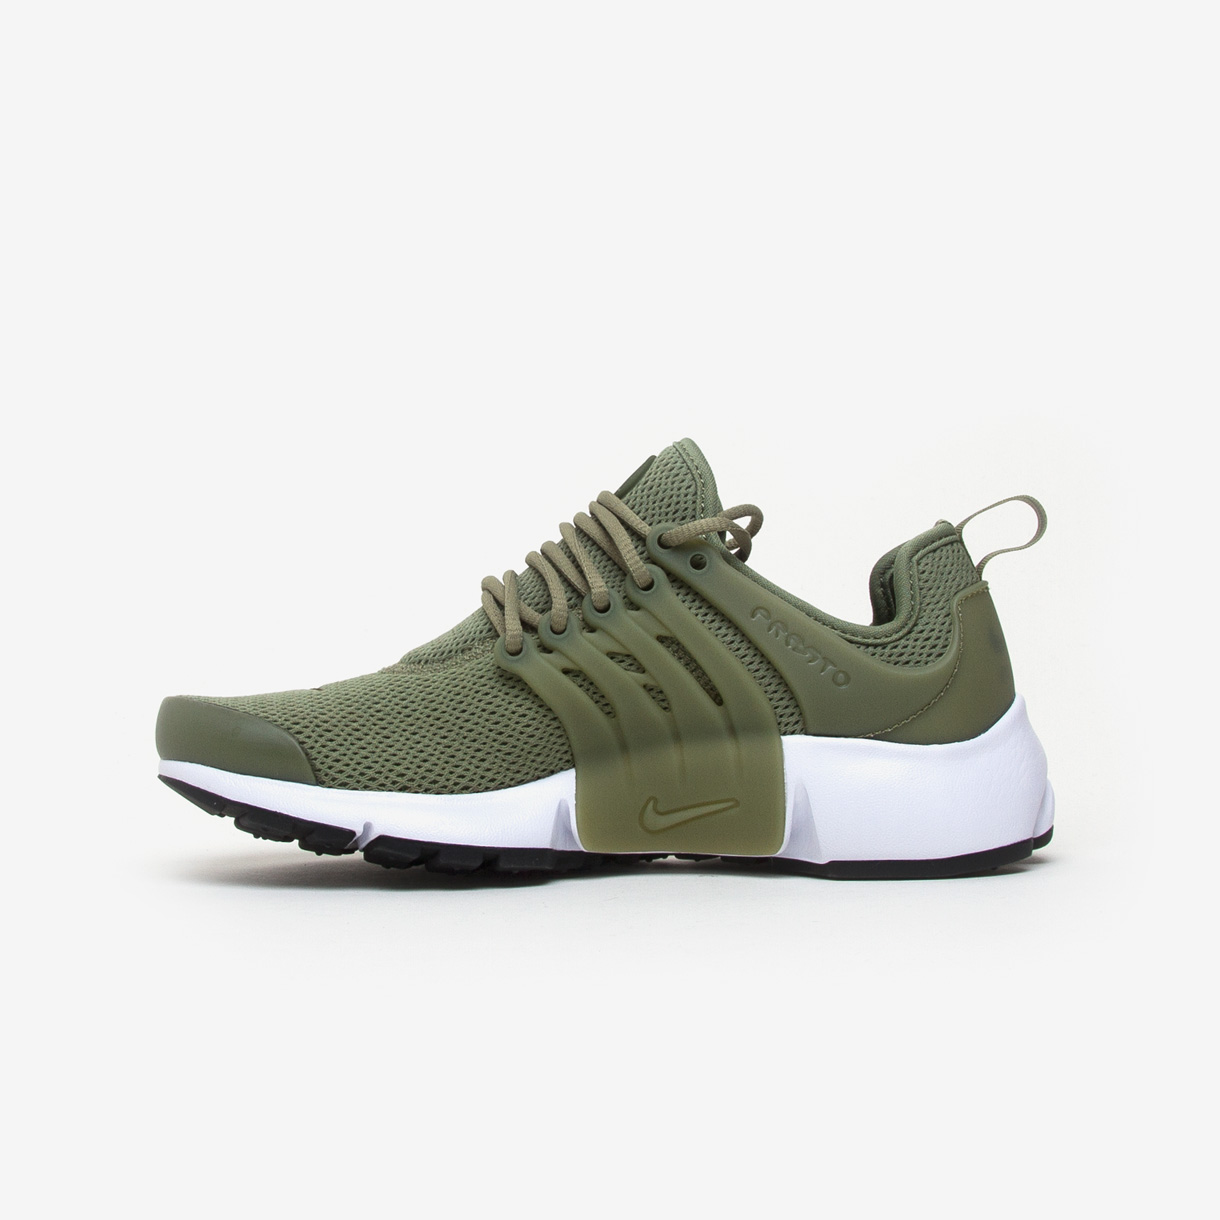 detailed look cd3cc d1d97 Buy Nike AIR PRESTO Wmns - Green   878068